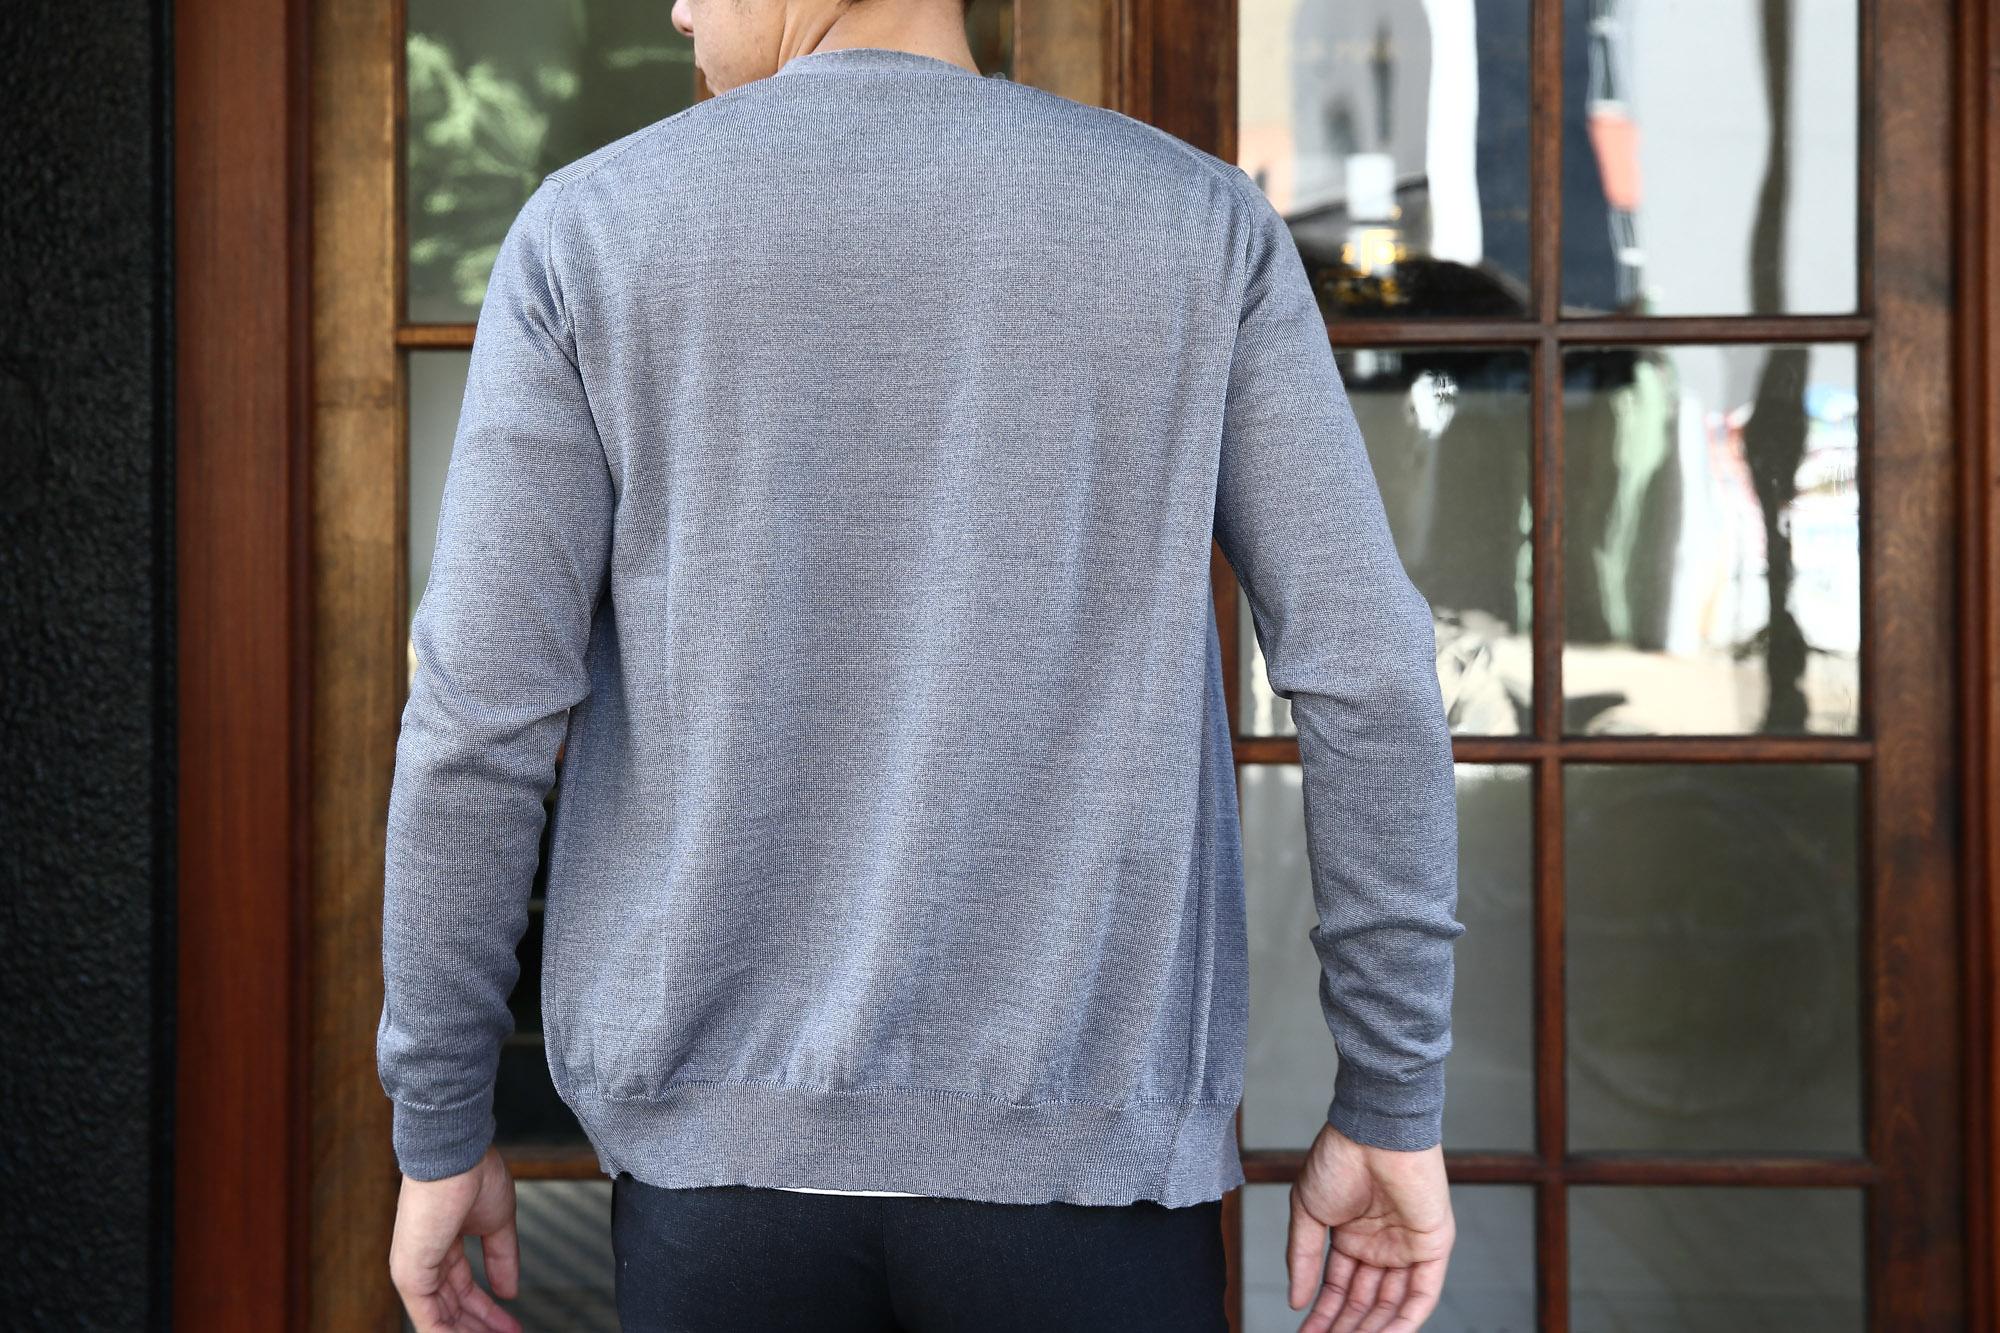 ZANONE(ザノーネ) CARDIGAN Sweaters V-Neck 811823 z0210 VIRGIN WOOL 100% ハイゲージニット ウールニット カーディガン GREY(グレー・Z3093) のコーディネート画像。2016年秋冬 新作 名古屋 愛知 ZODIAC 入荷しました。